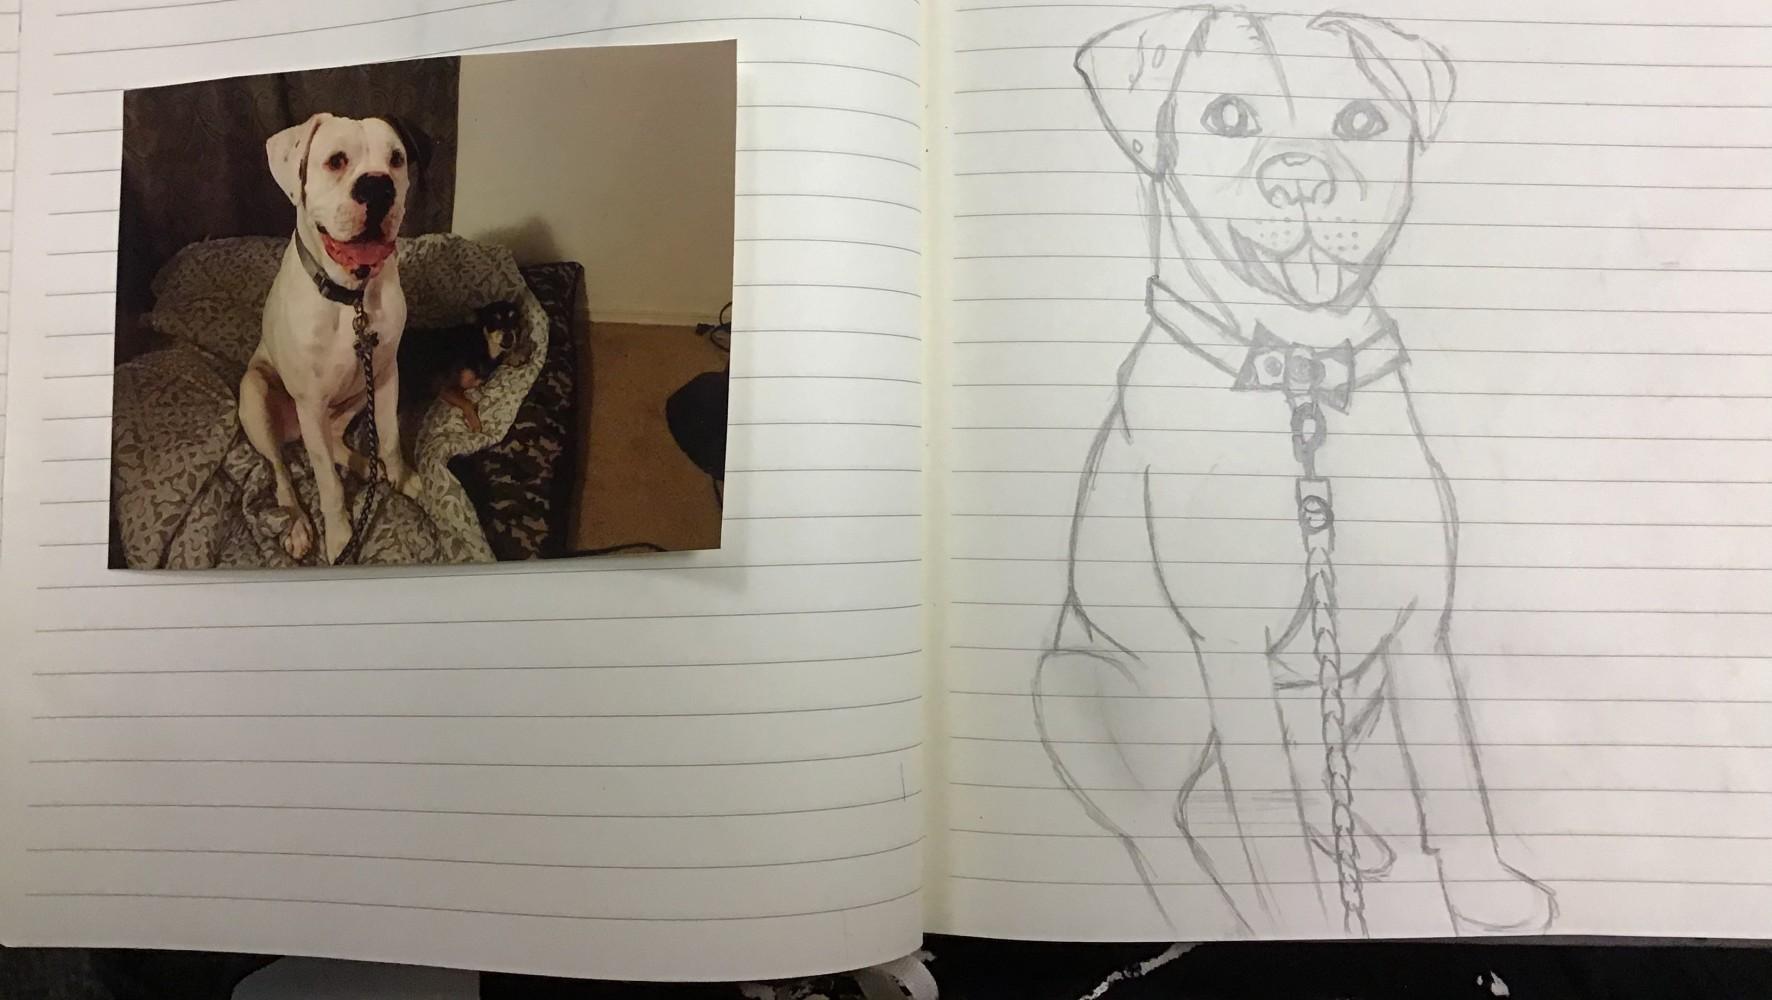 main-image-Opie the dog uploaded by Babykitten1613